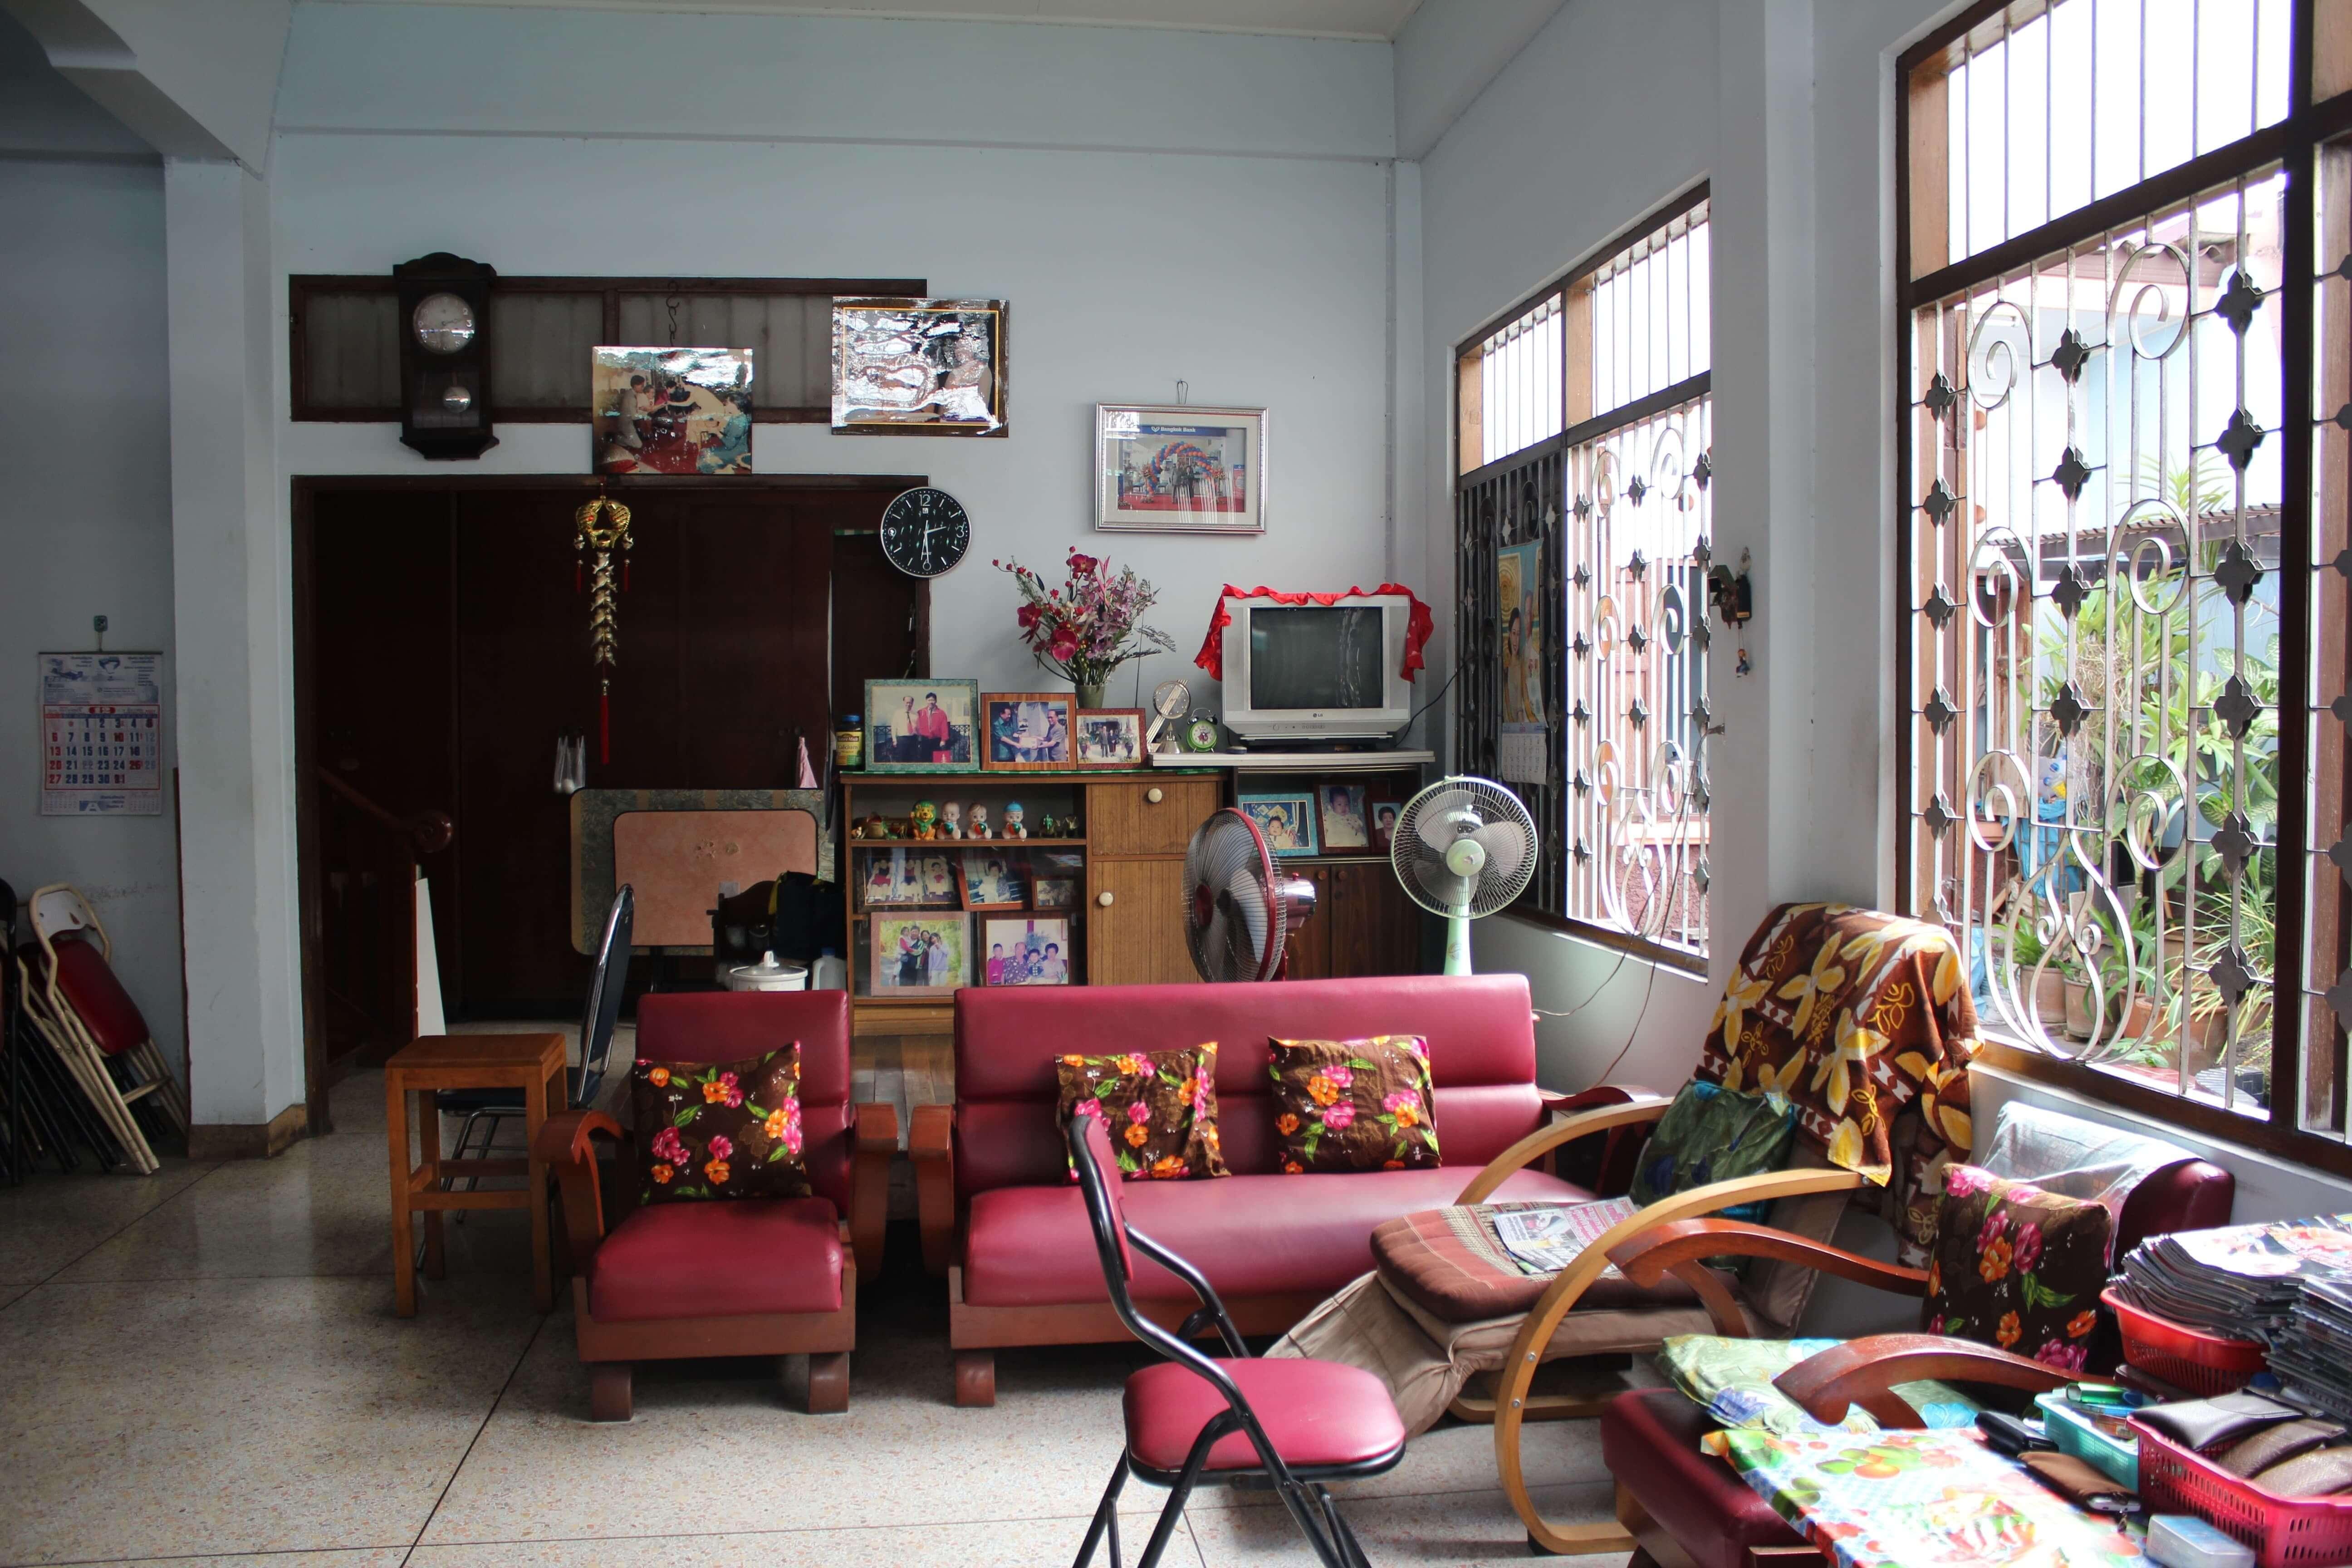 дизайн интерьера залы в квартире